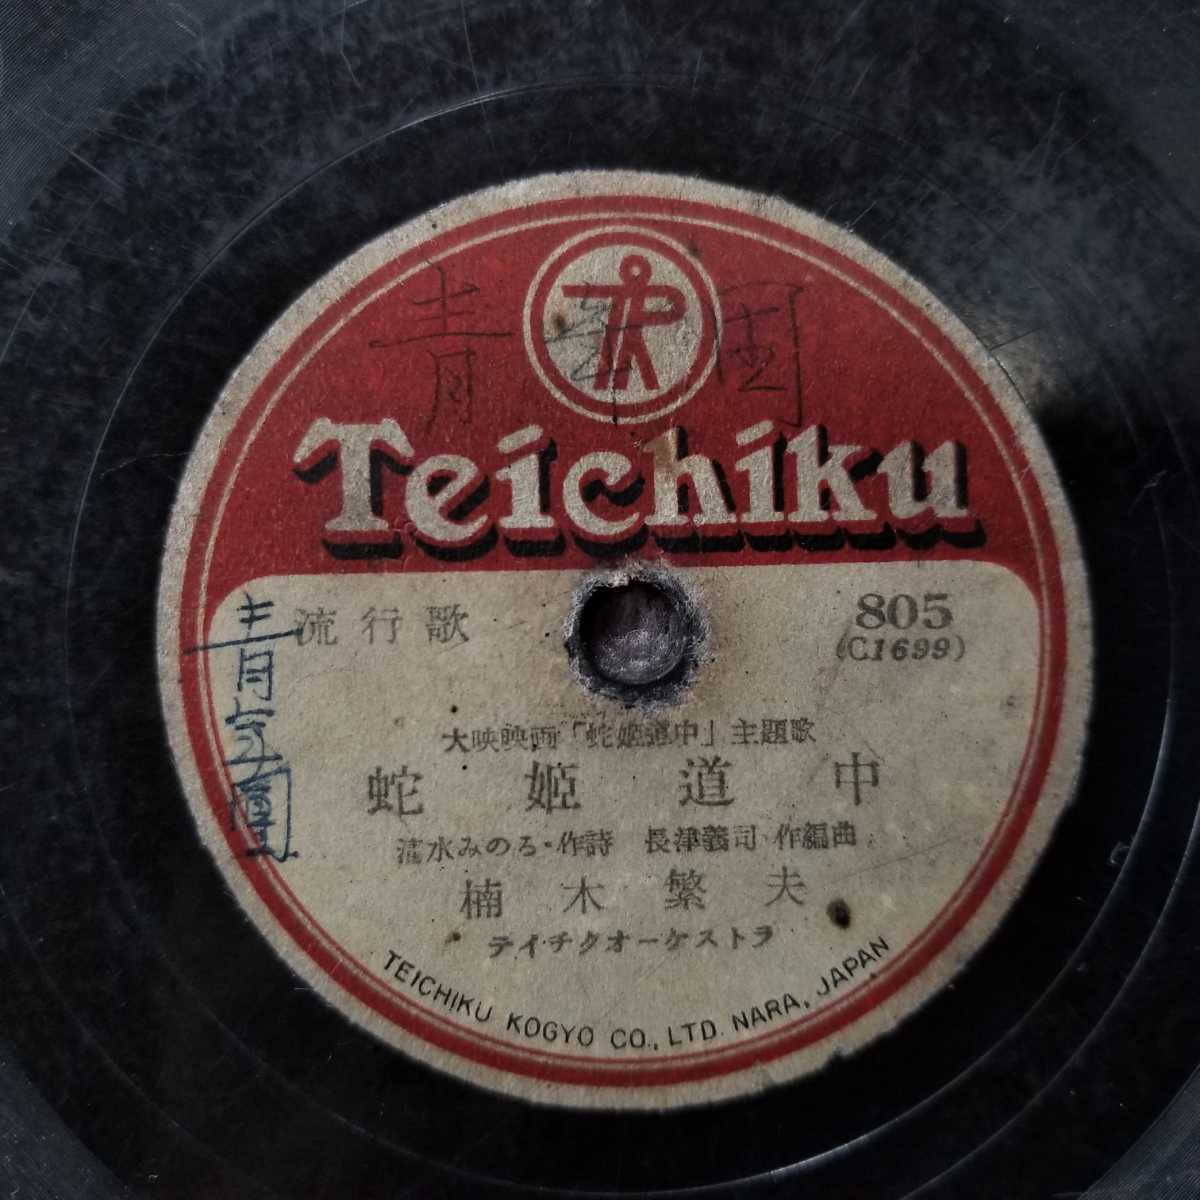 流行歌 映画主題歌 蛇姫道中 楠木繁夫 他不明 蓄音機SPレコード盤10インチ(25cm) (39_画像1